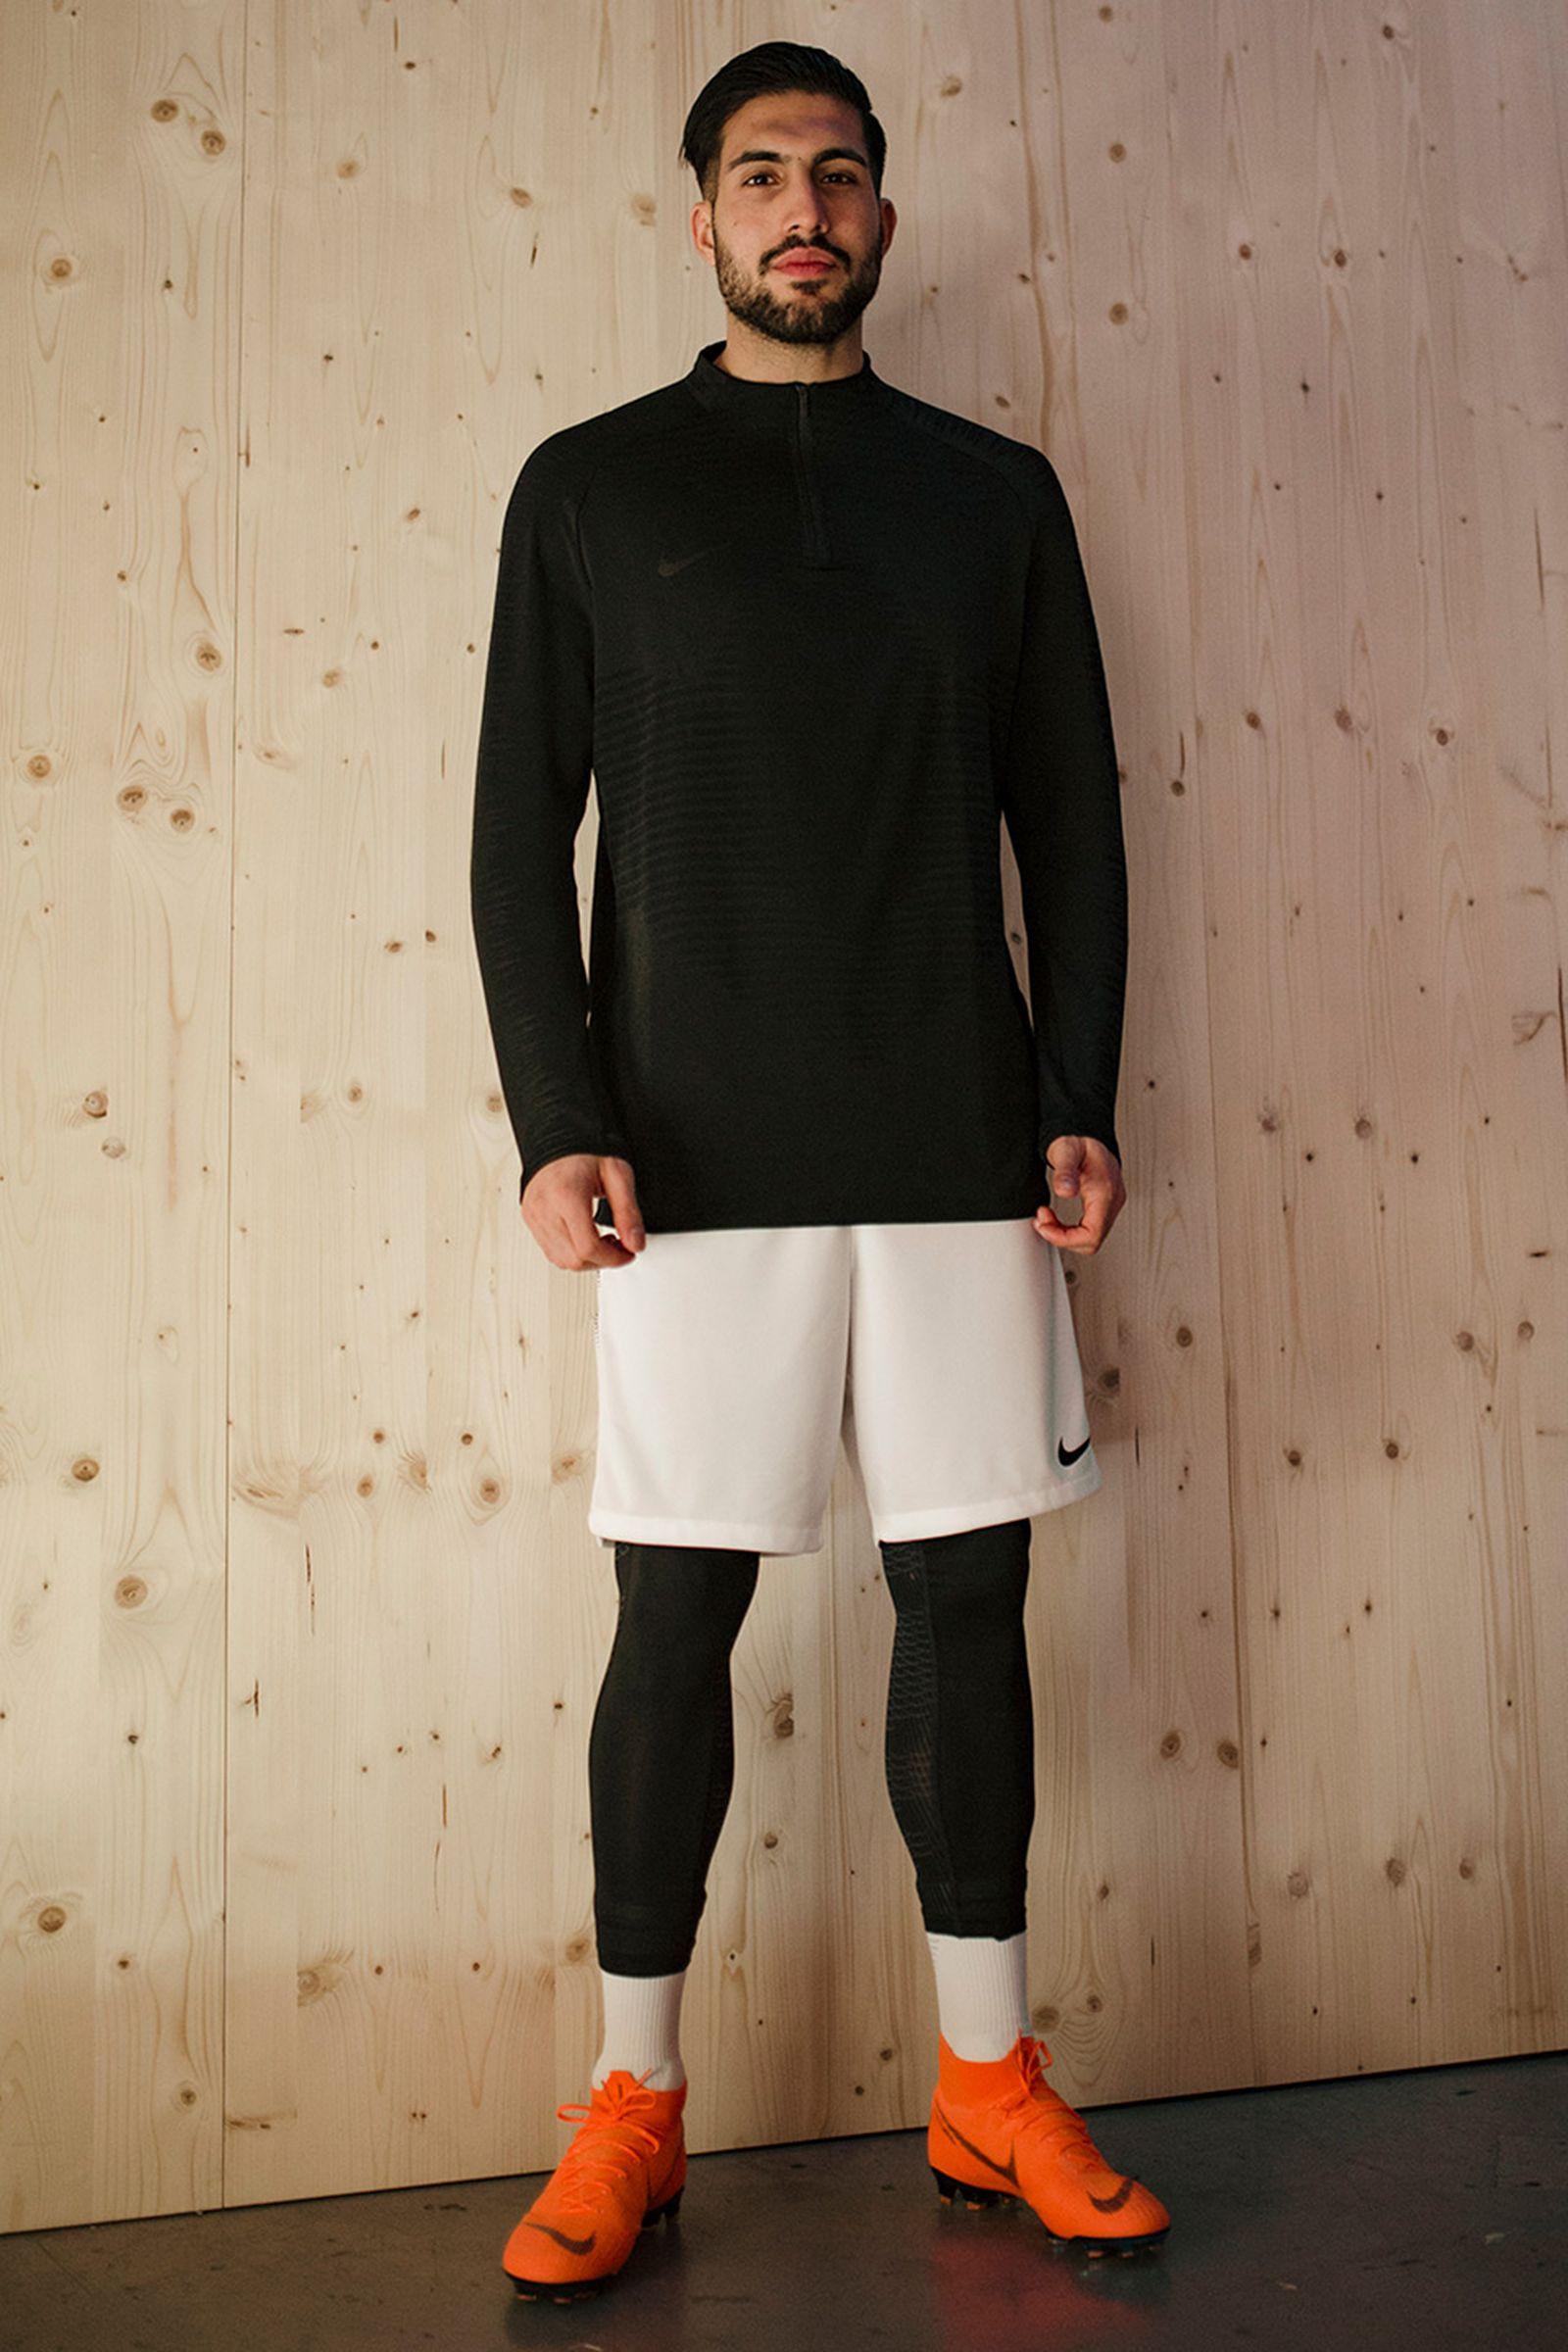 nike-mercurial-superfly-football-boot-04